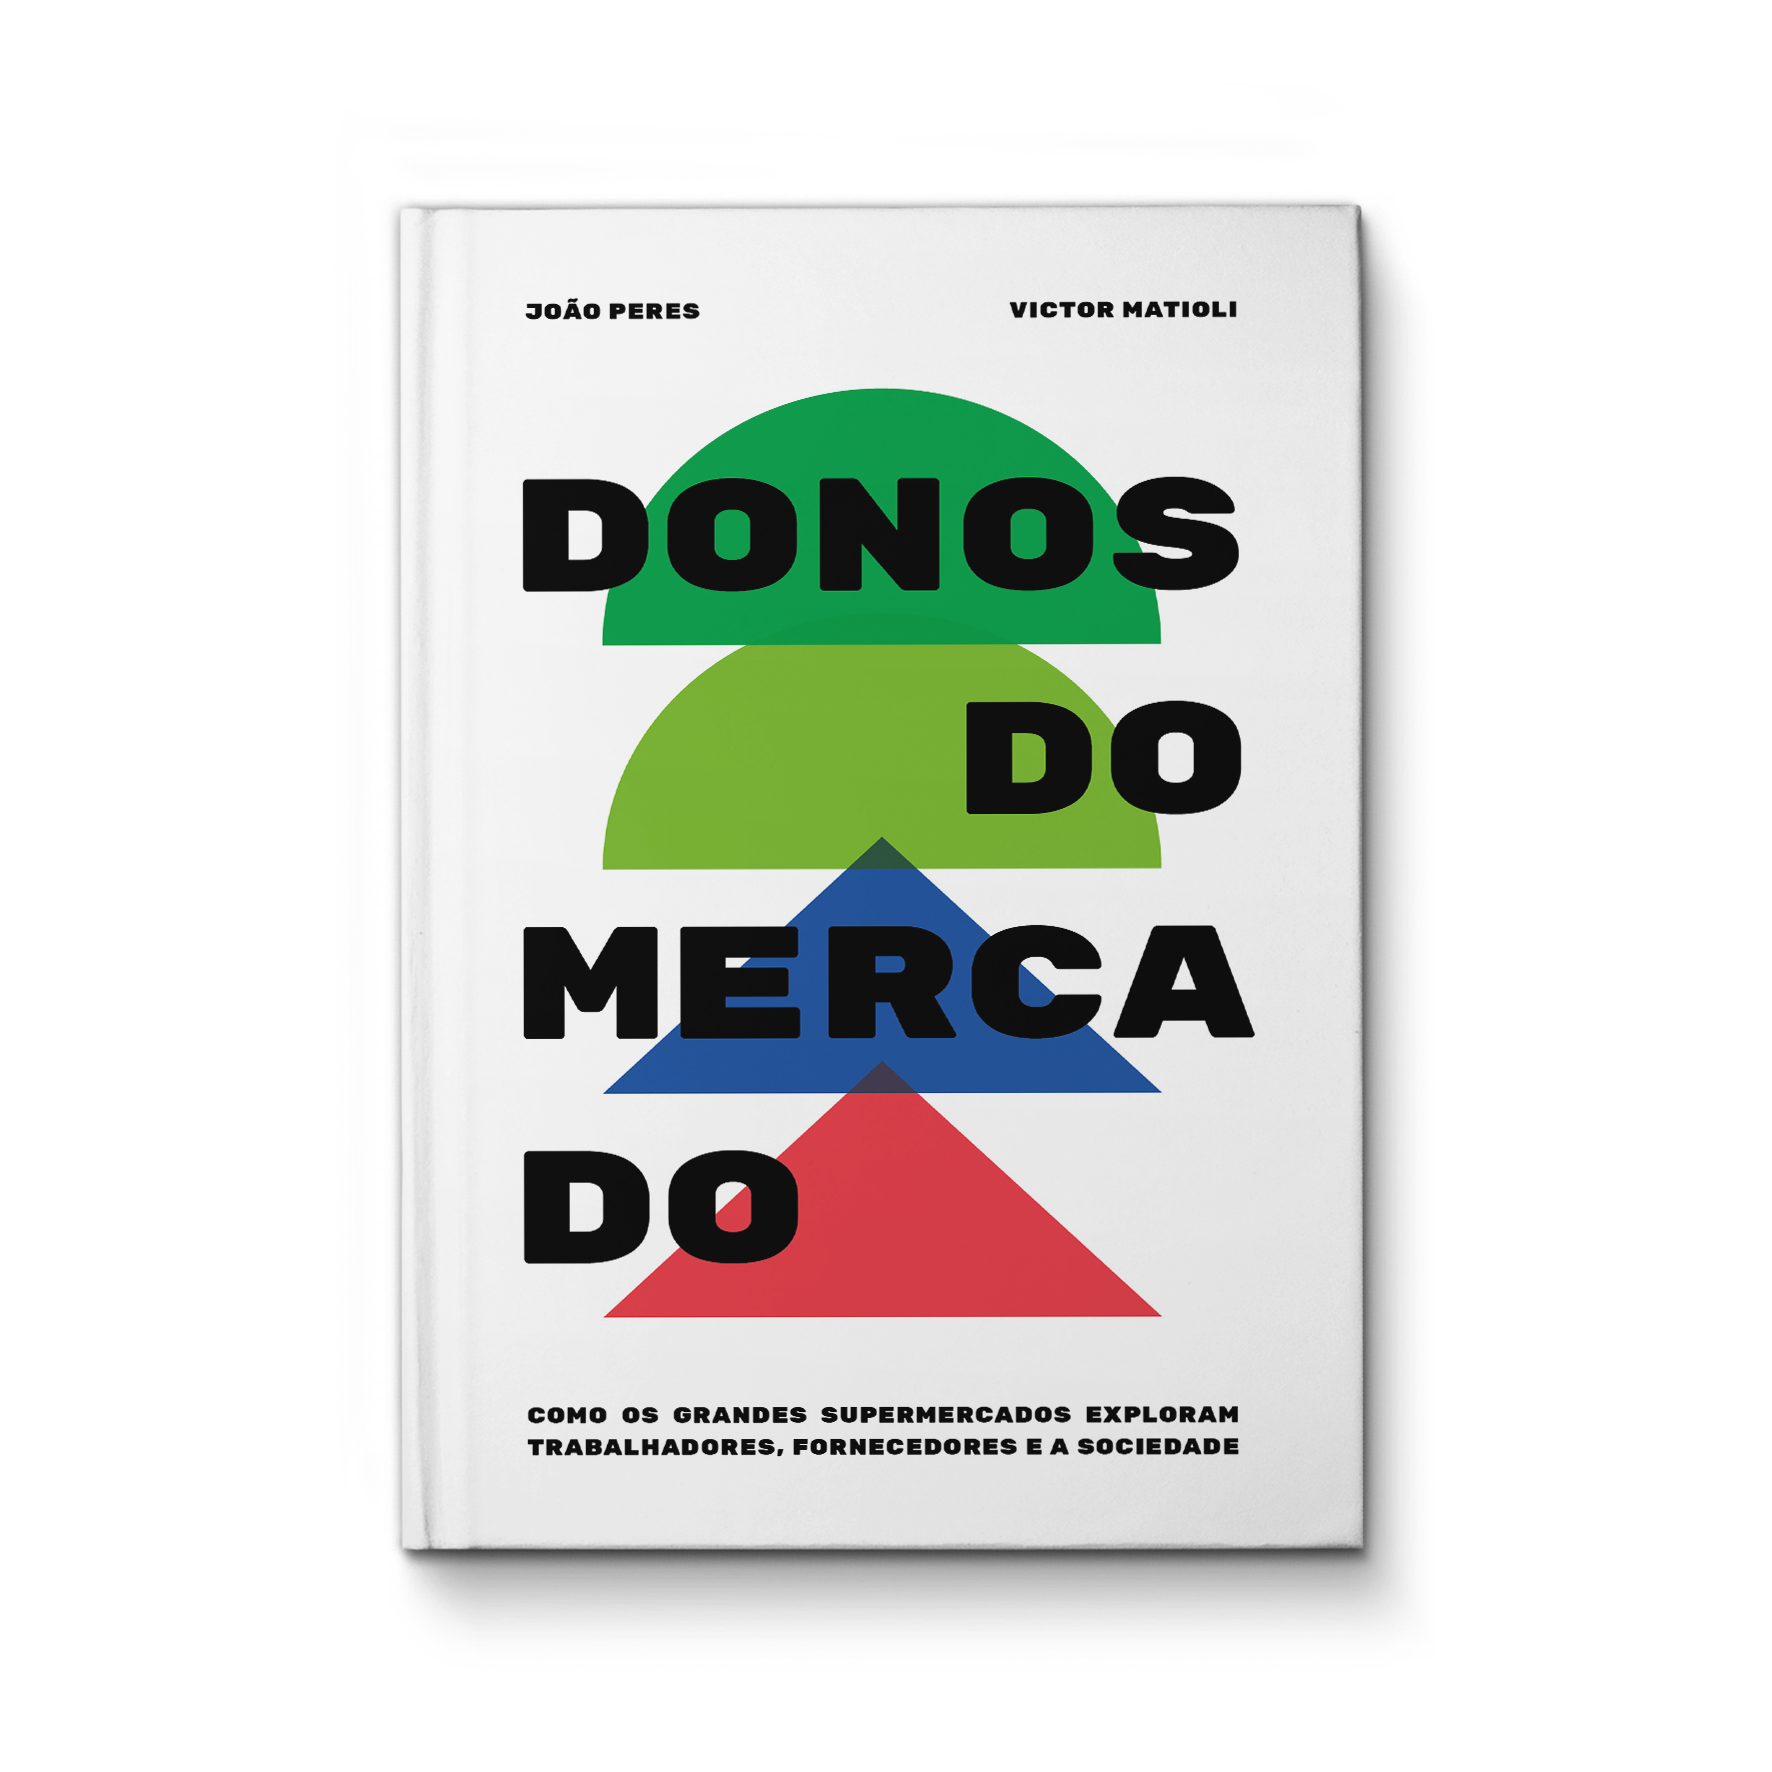 Donos do mercado – João Peres e Victor Matioli